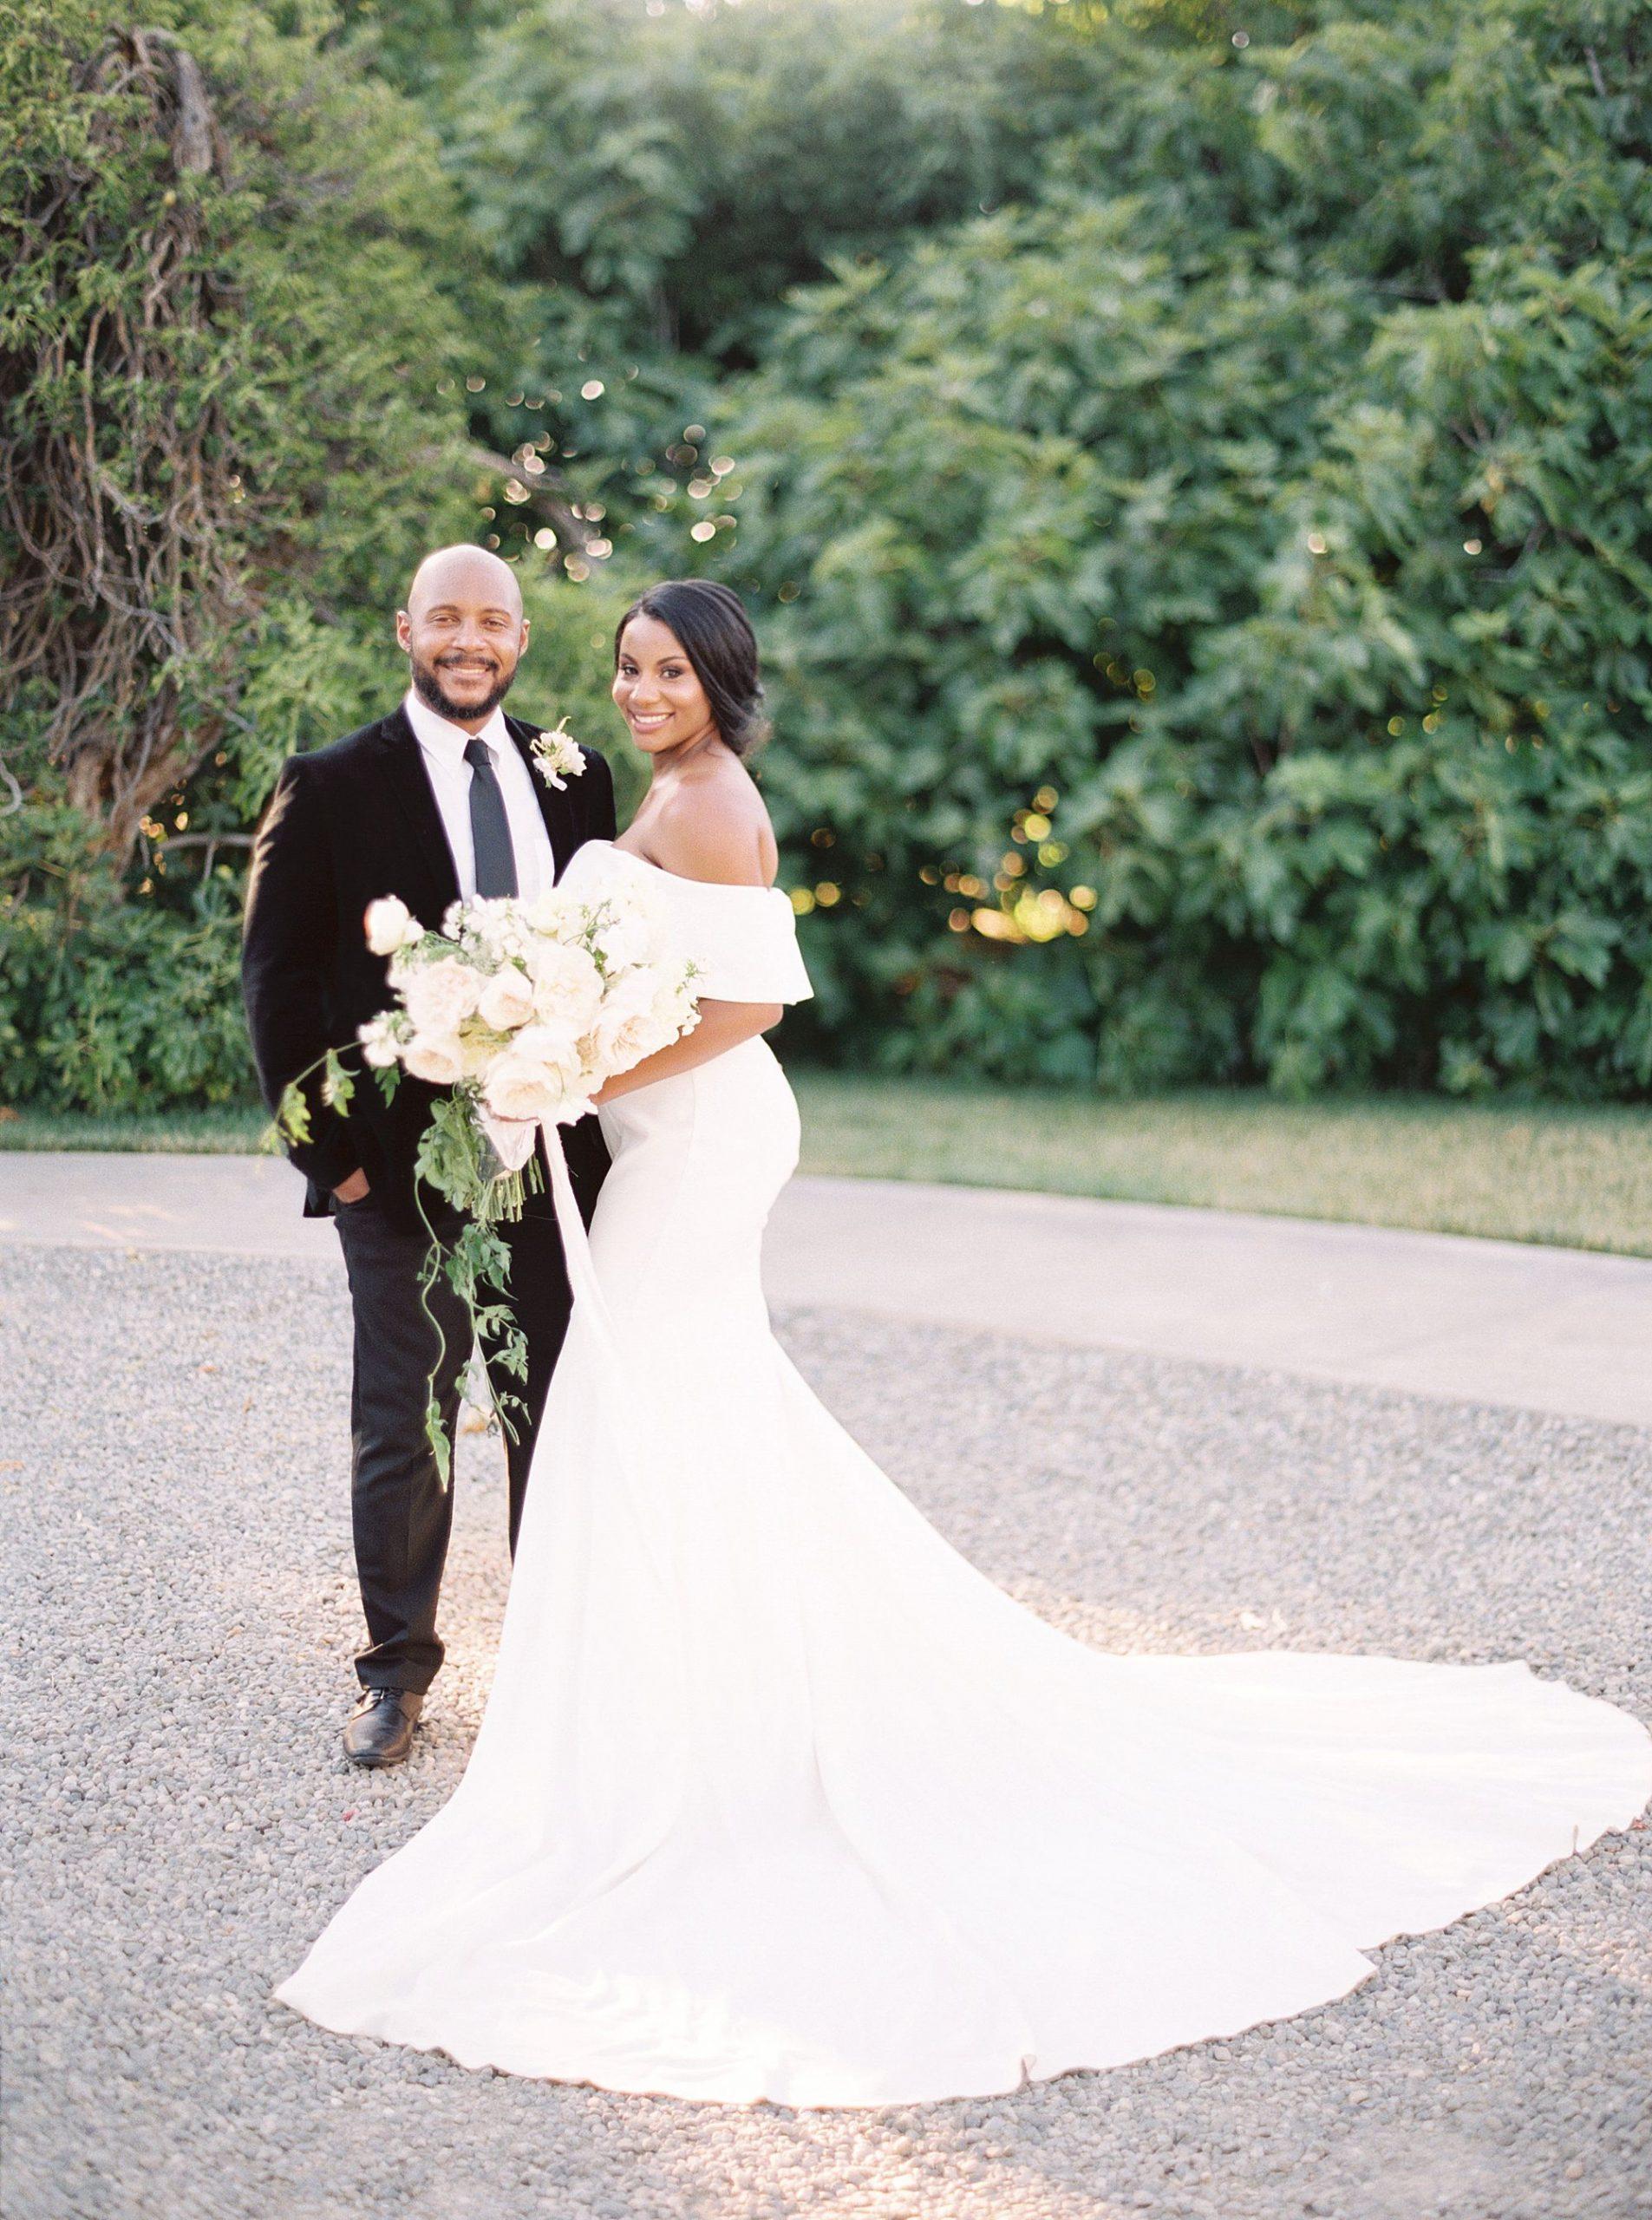 Park Winters Micro-Wedding Inspiration on Style Me Pretty - Stephanie Teague Events - Ashley Baumgartner - Park Winters Wedding - Black Tie Wedding - Micro-Wedding Sacramento Photographer_0072.jpg